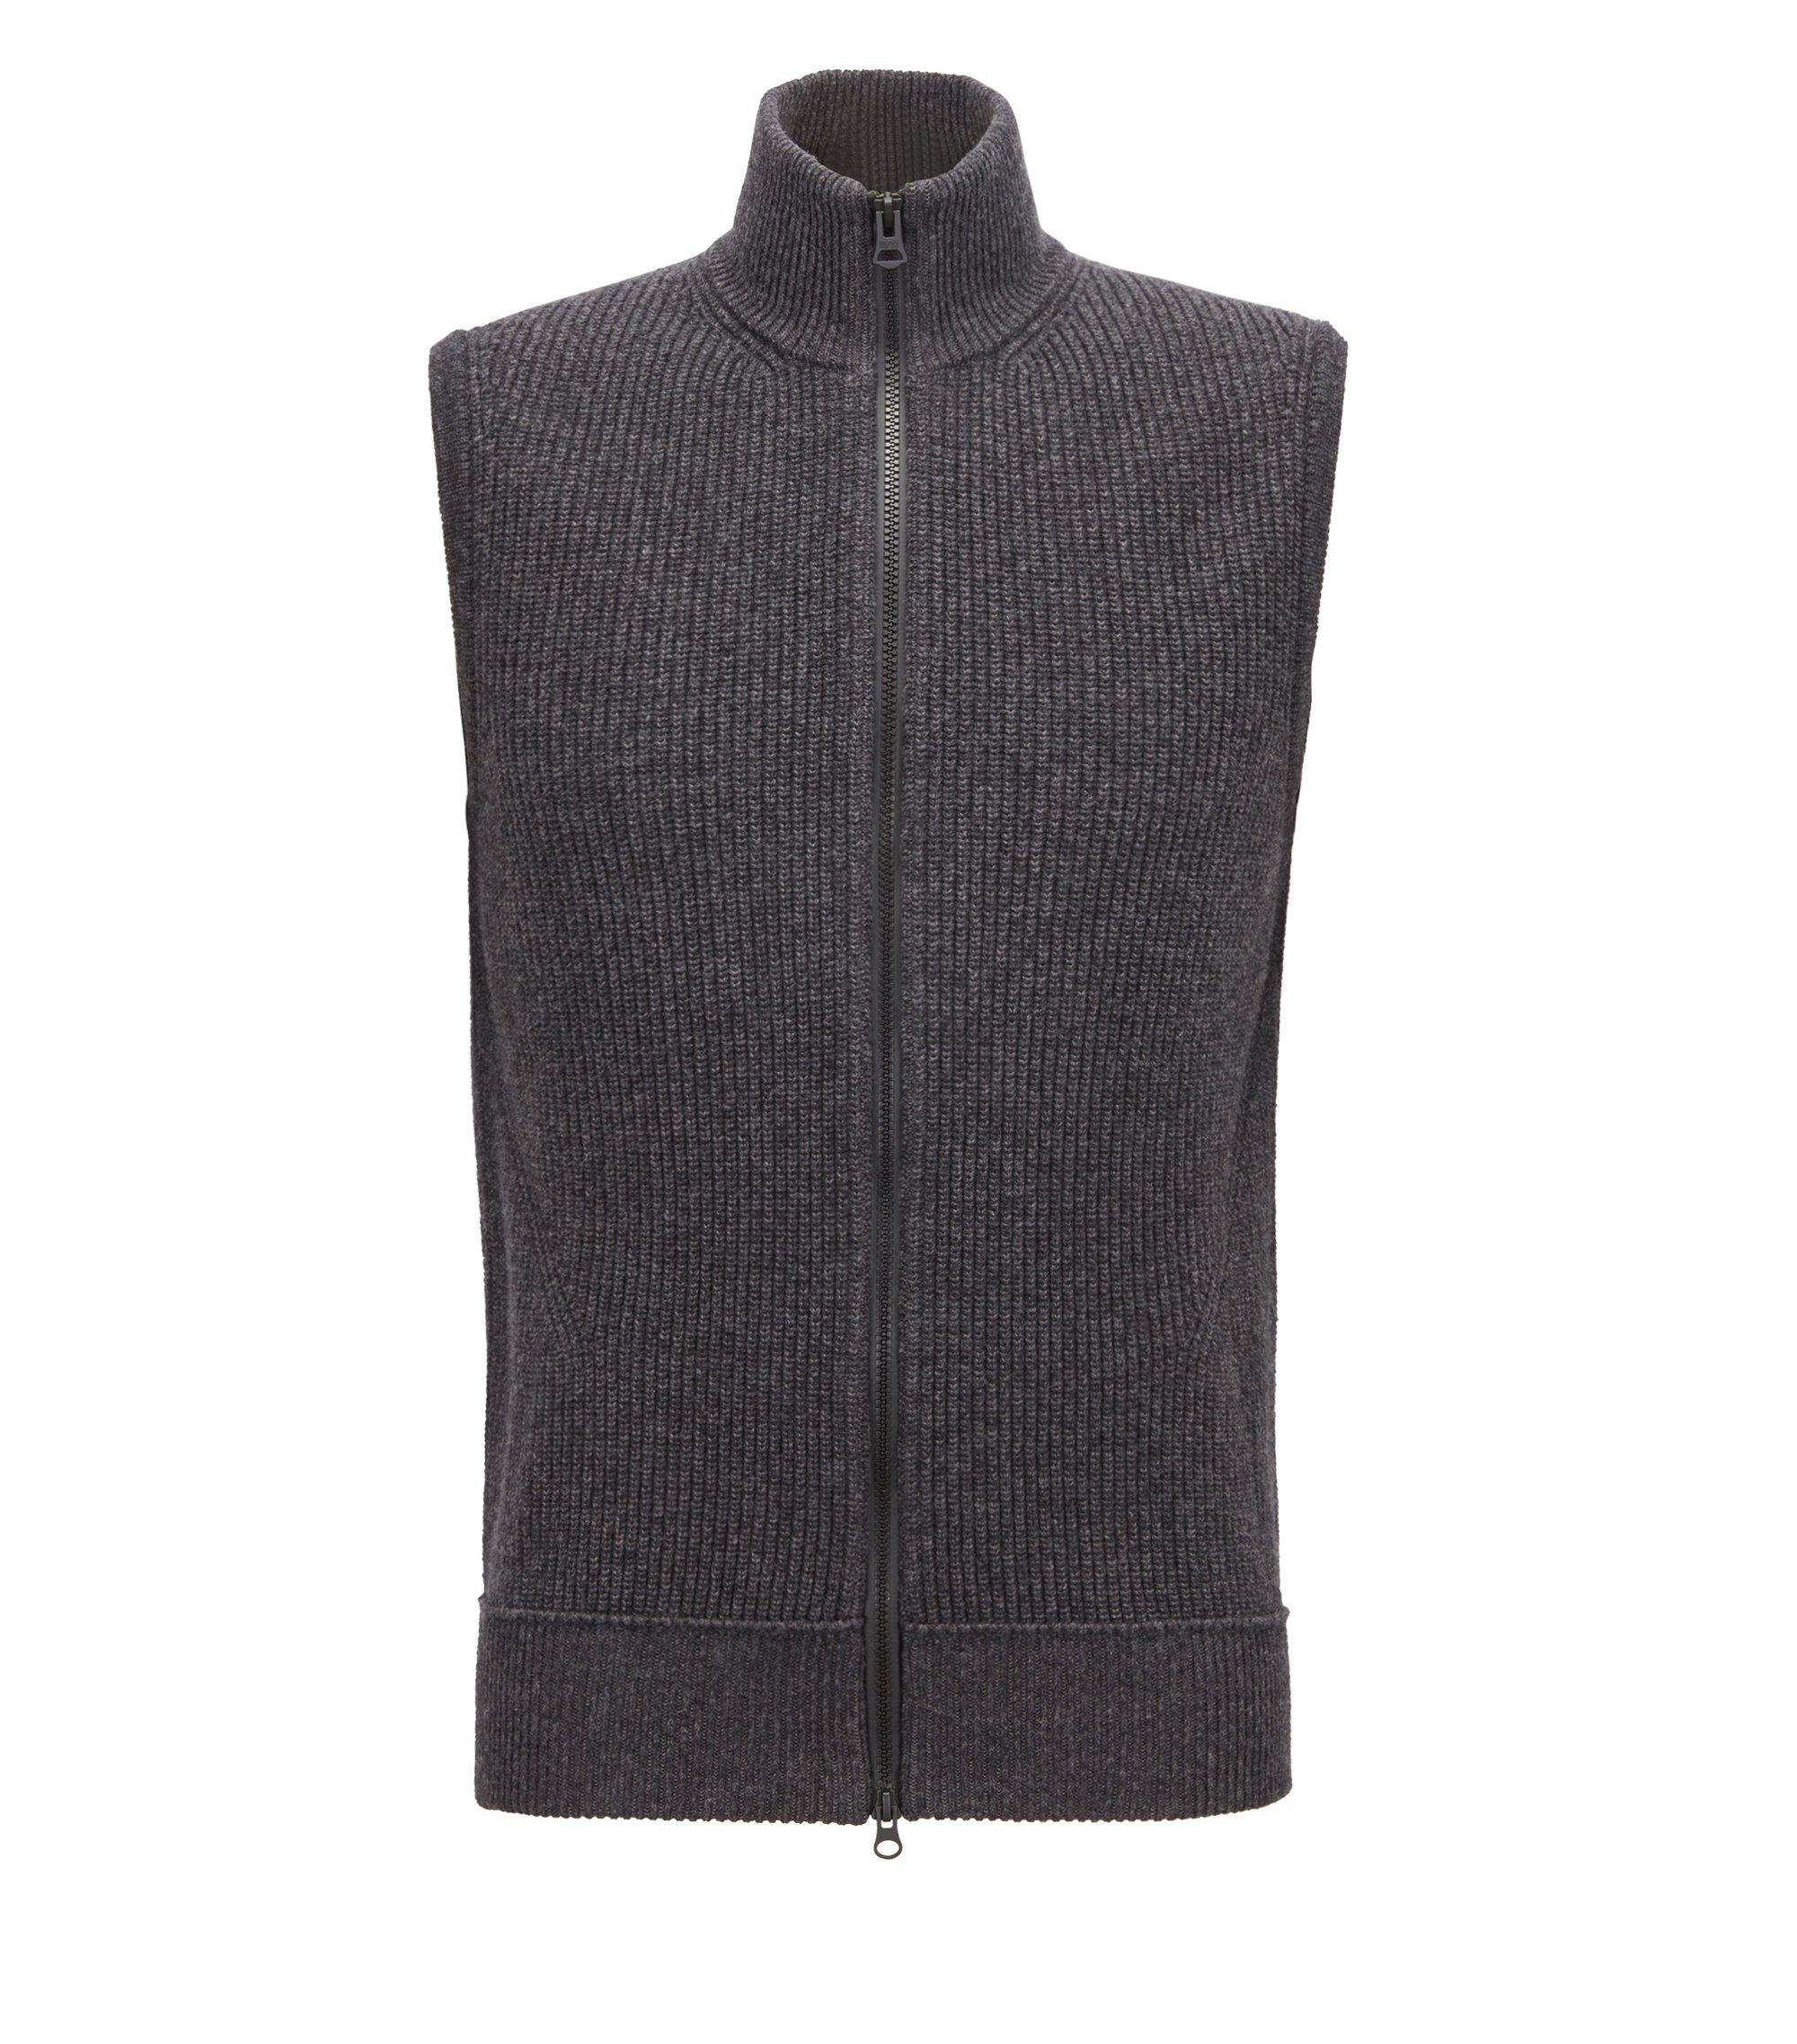 Cotton-blend sleeveless sweater with zip-through front, Dark Grey